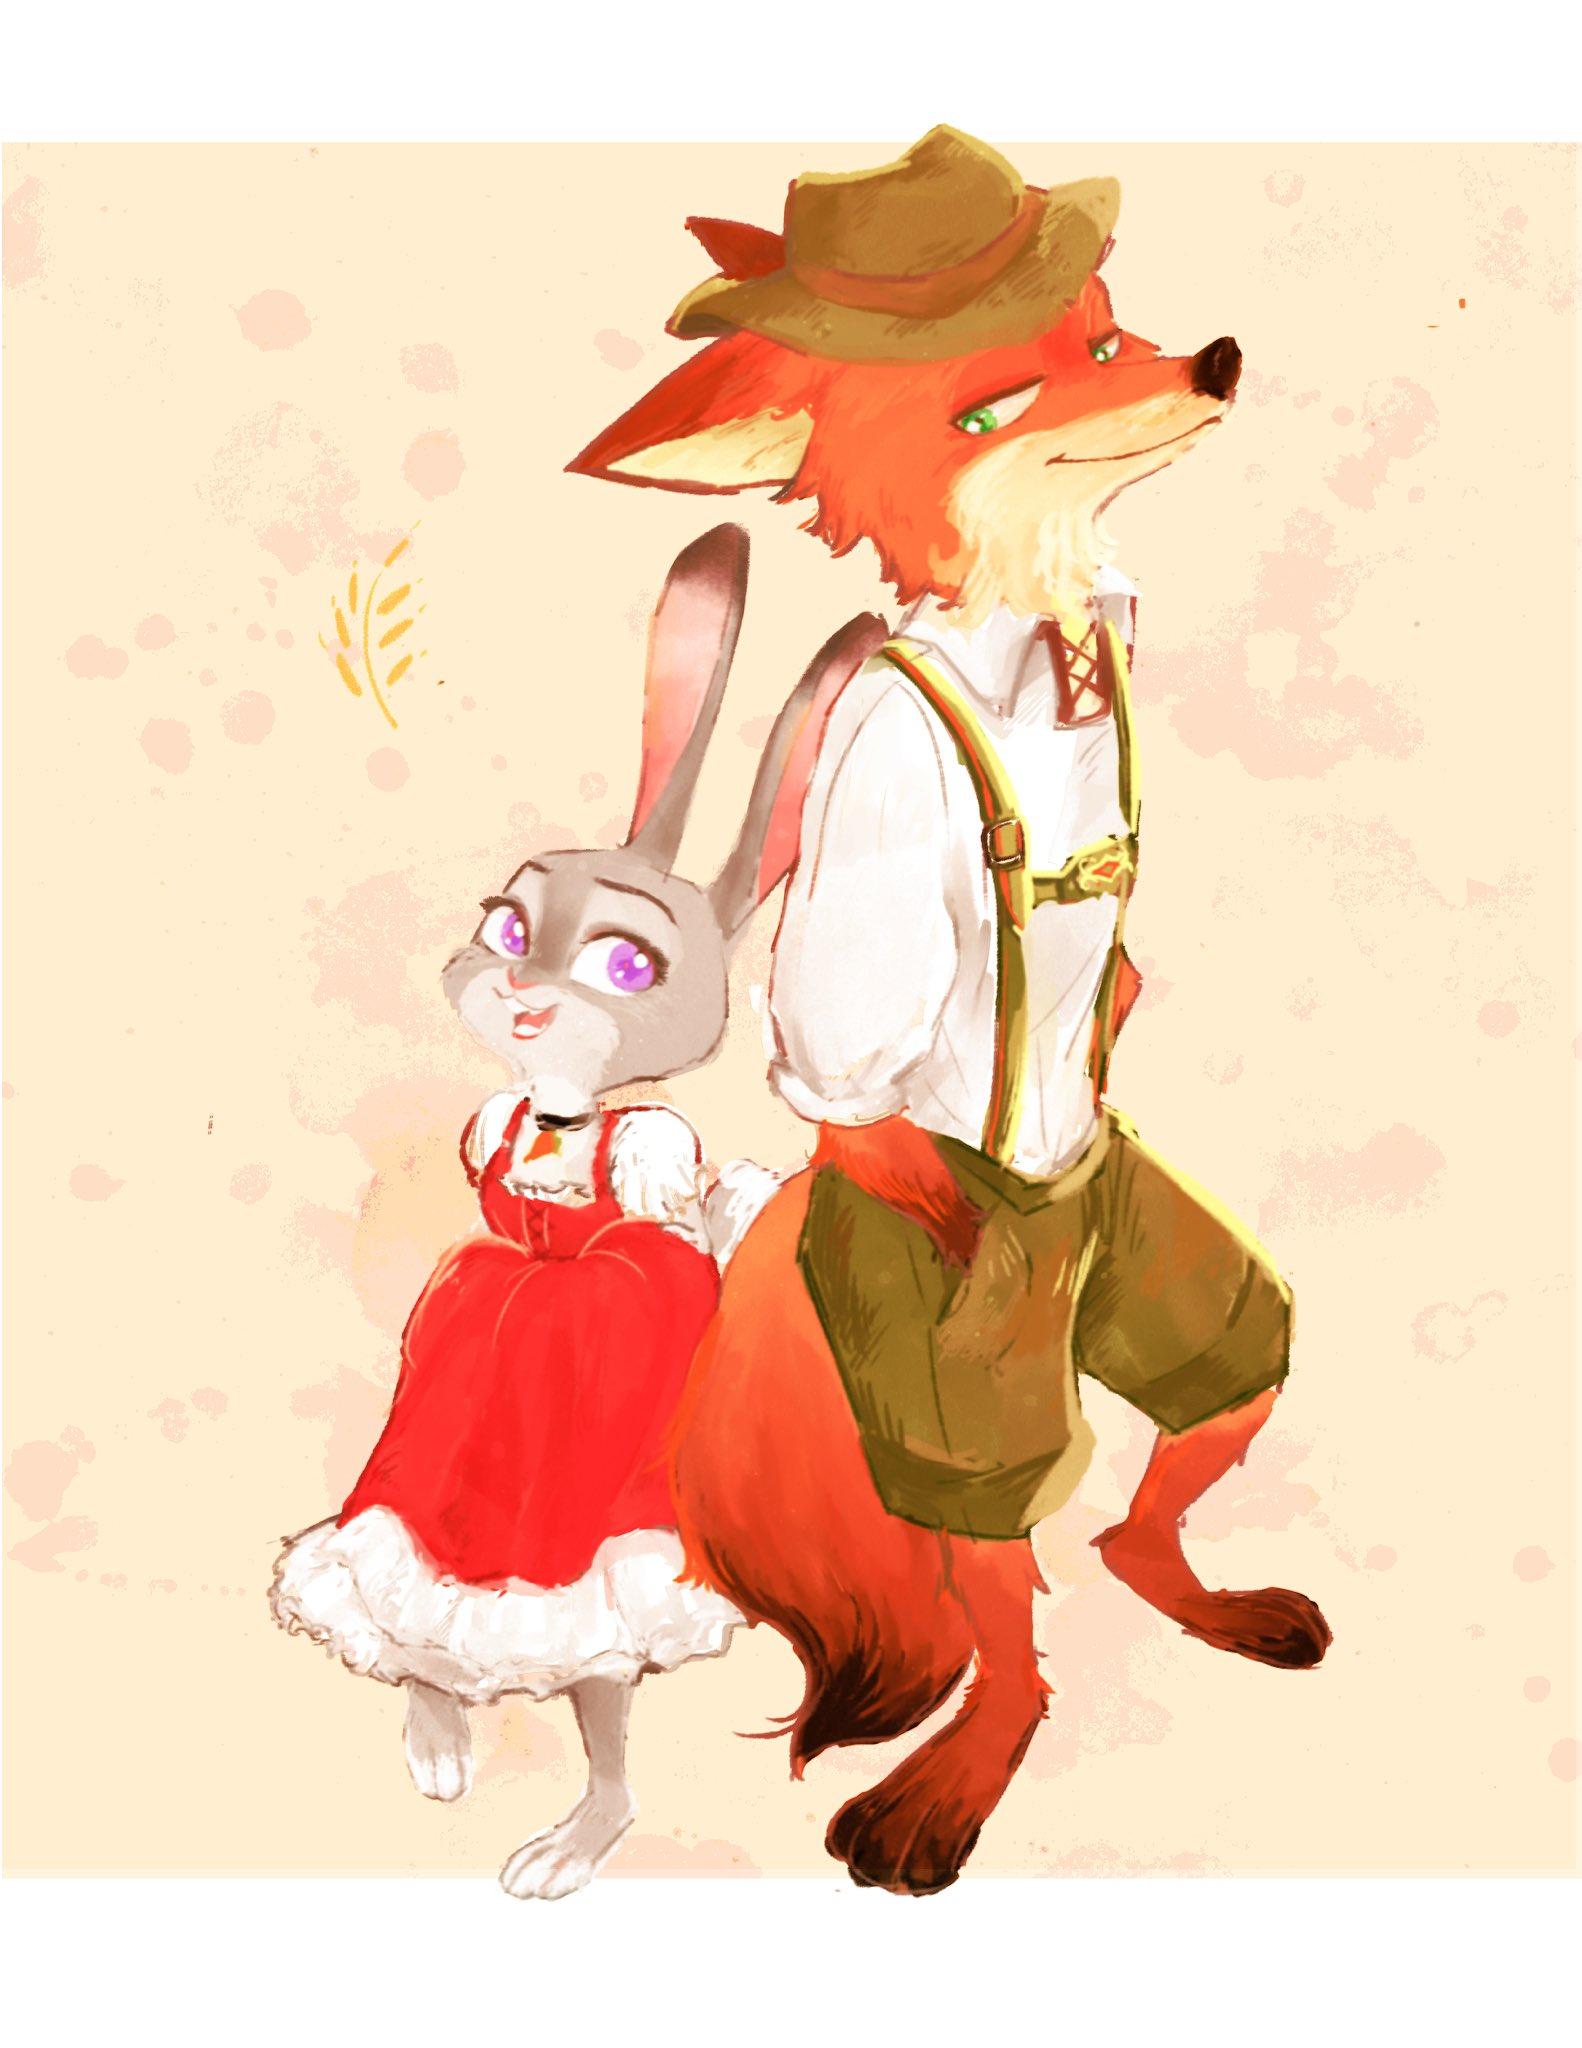 e926 2017 anthro barefoot canine clothed clothing disney duo female fox fur hi_res judy_hopps kabe2mugi lagomorph male mammal nick_wilde rabbit simple_background zootopia